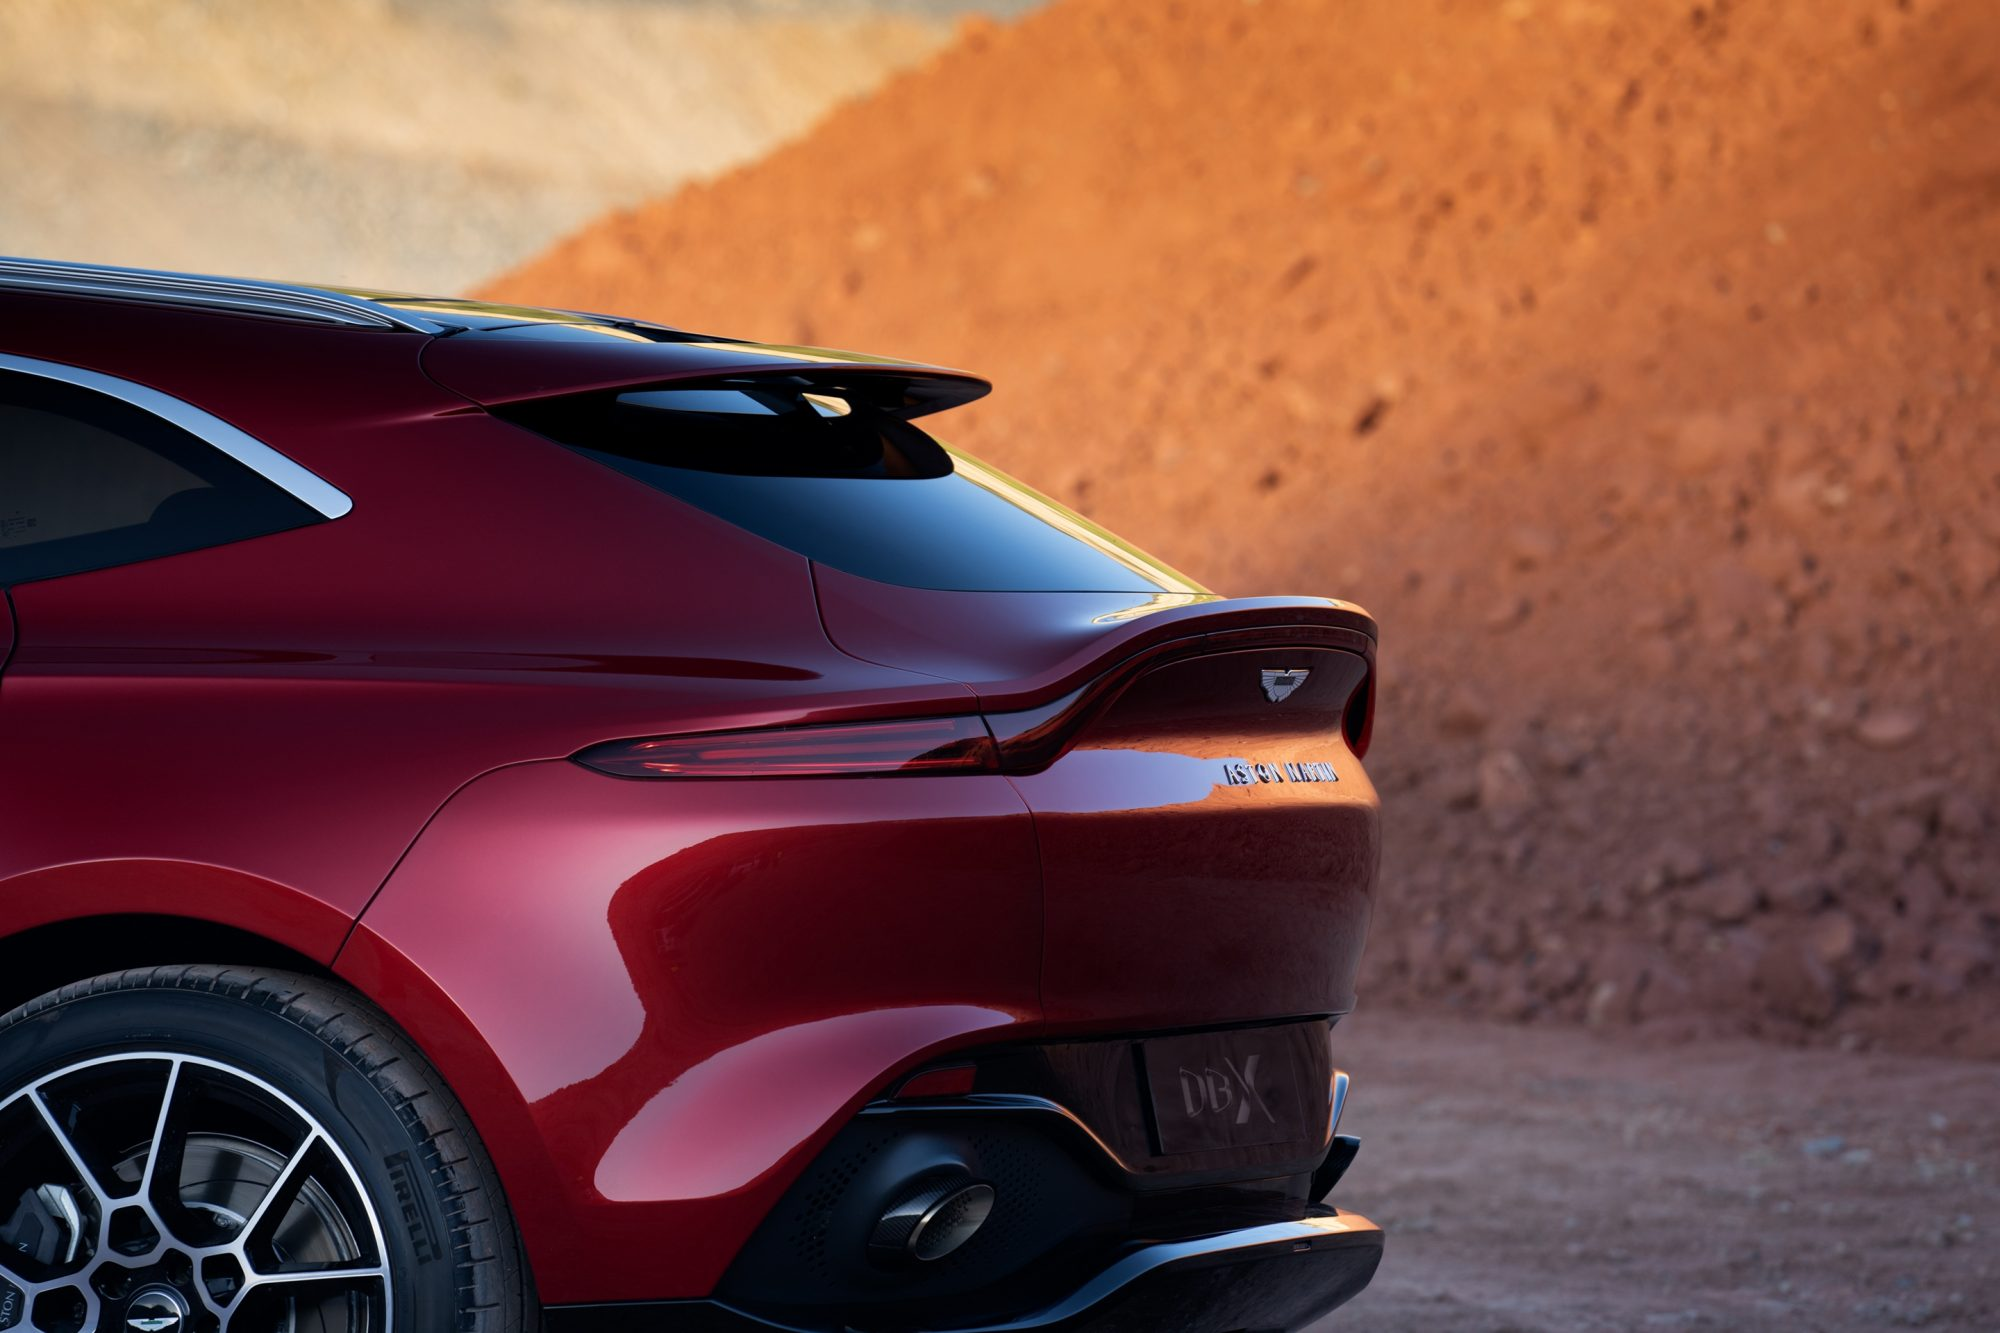 Aston Martin DBX suv - petrolhead corner - 1